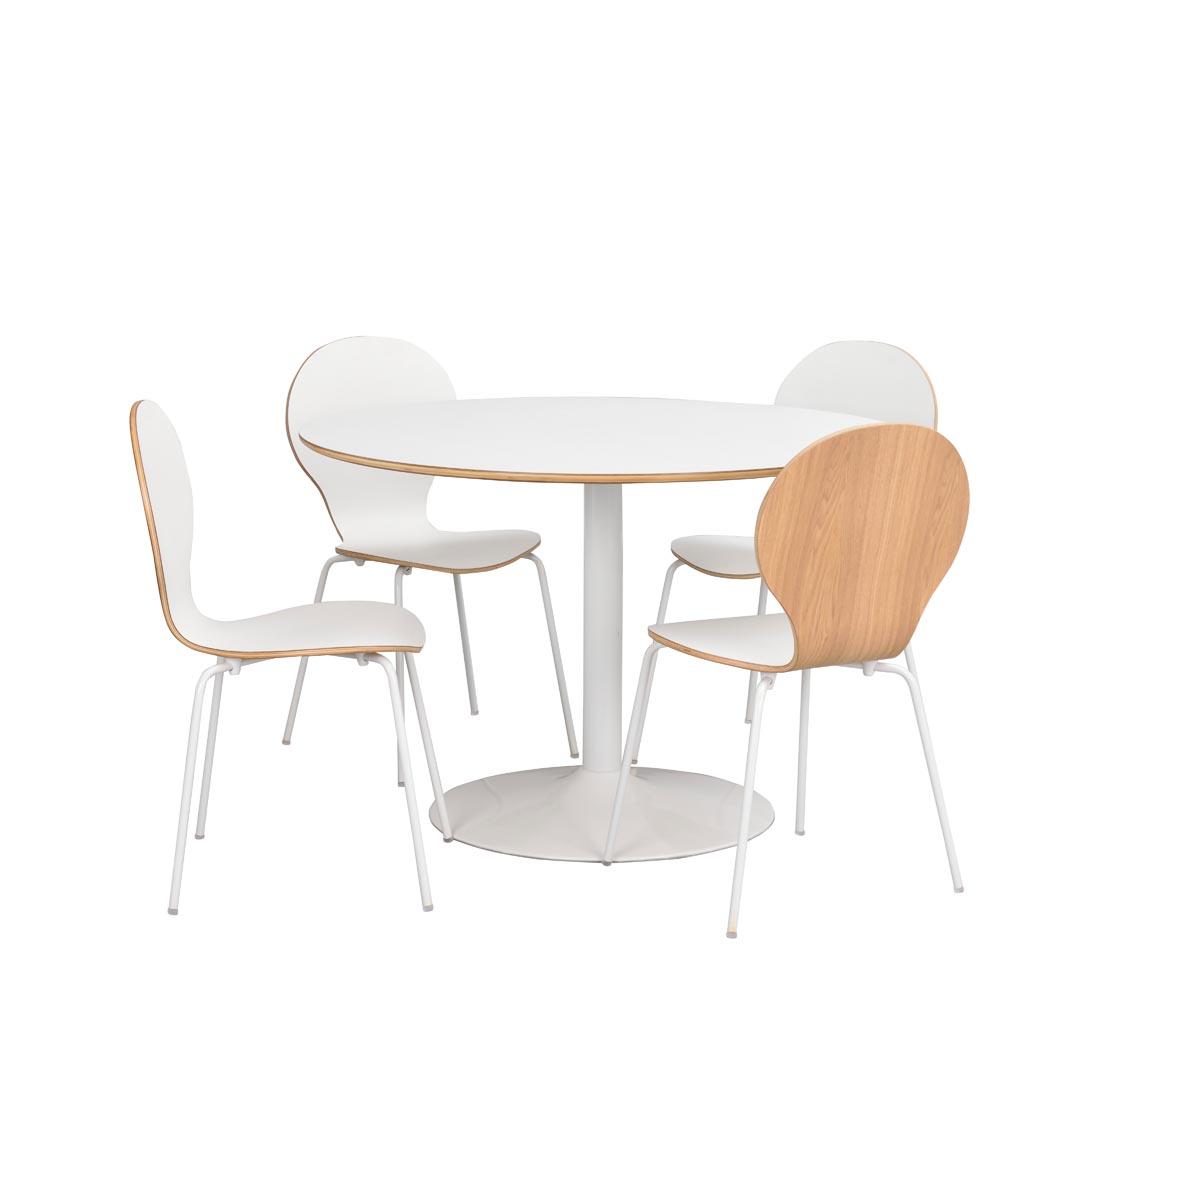 Fusion matbord runt m vit trumpetfot 118224_b + stol 117262 R